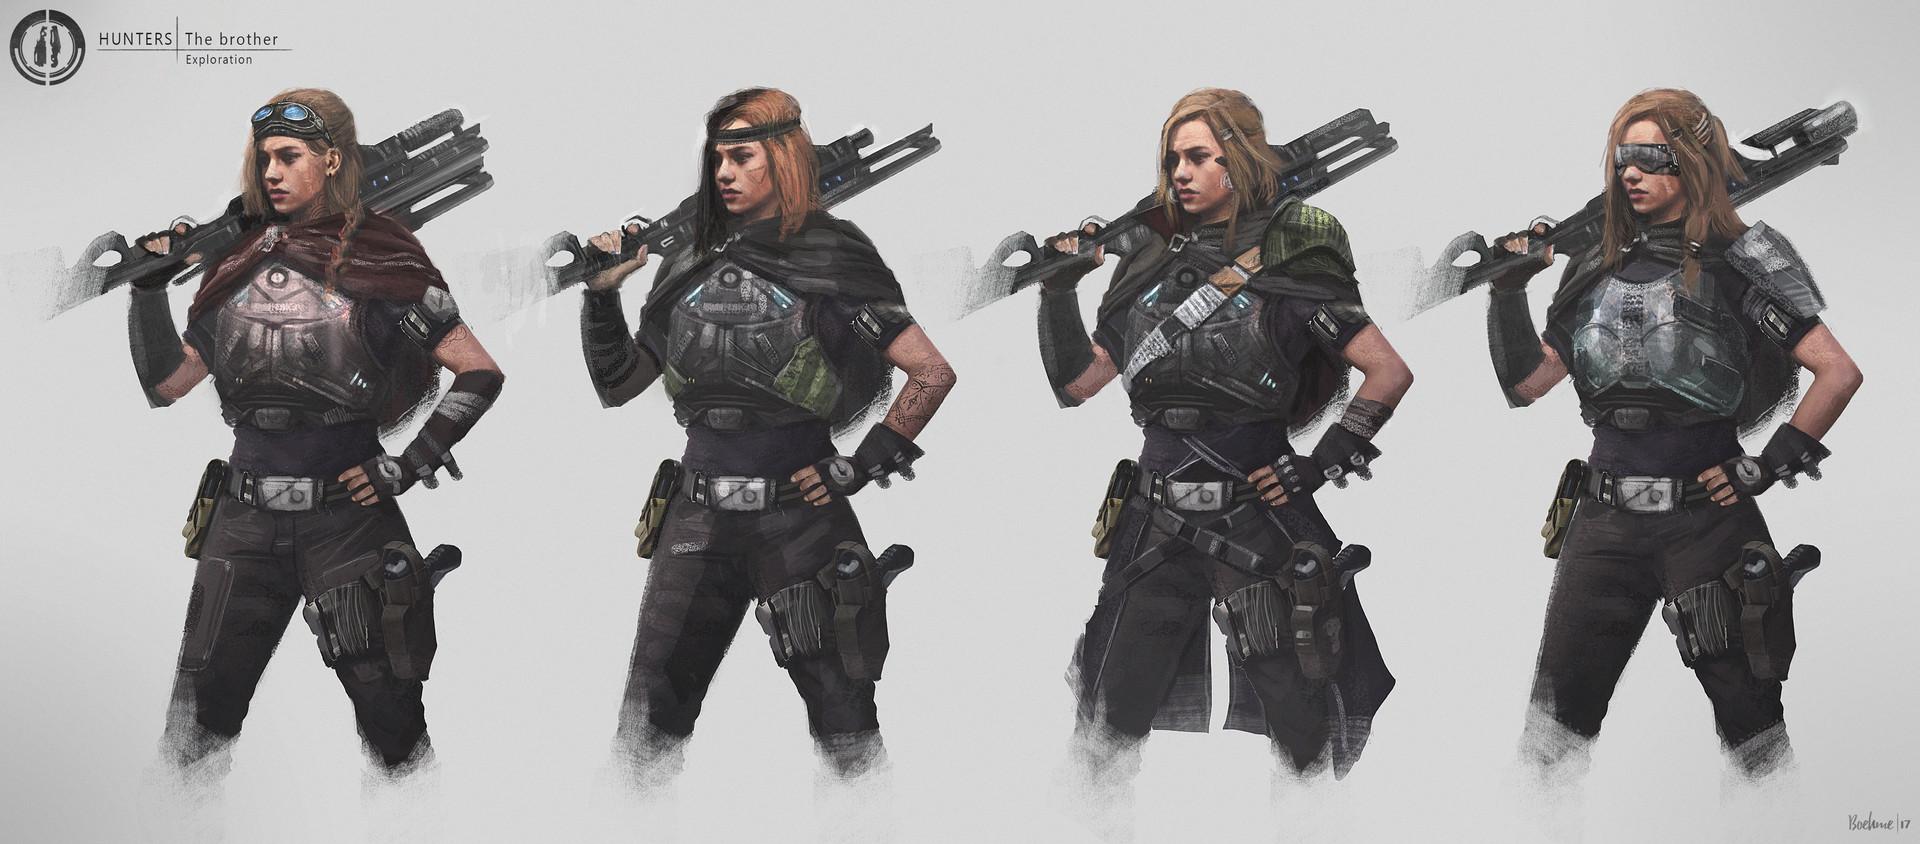 Mobo boehme hunter variations sister